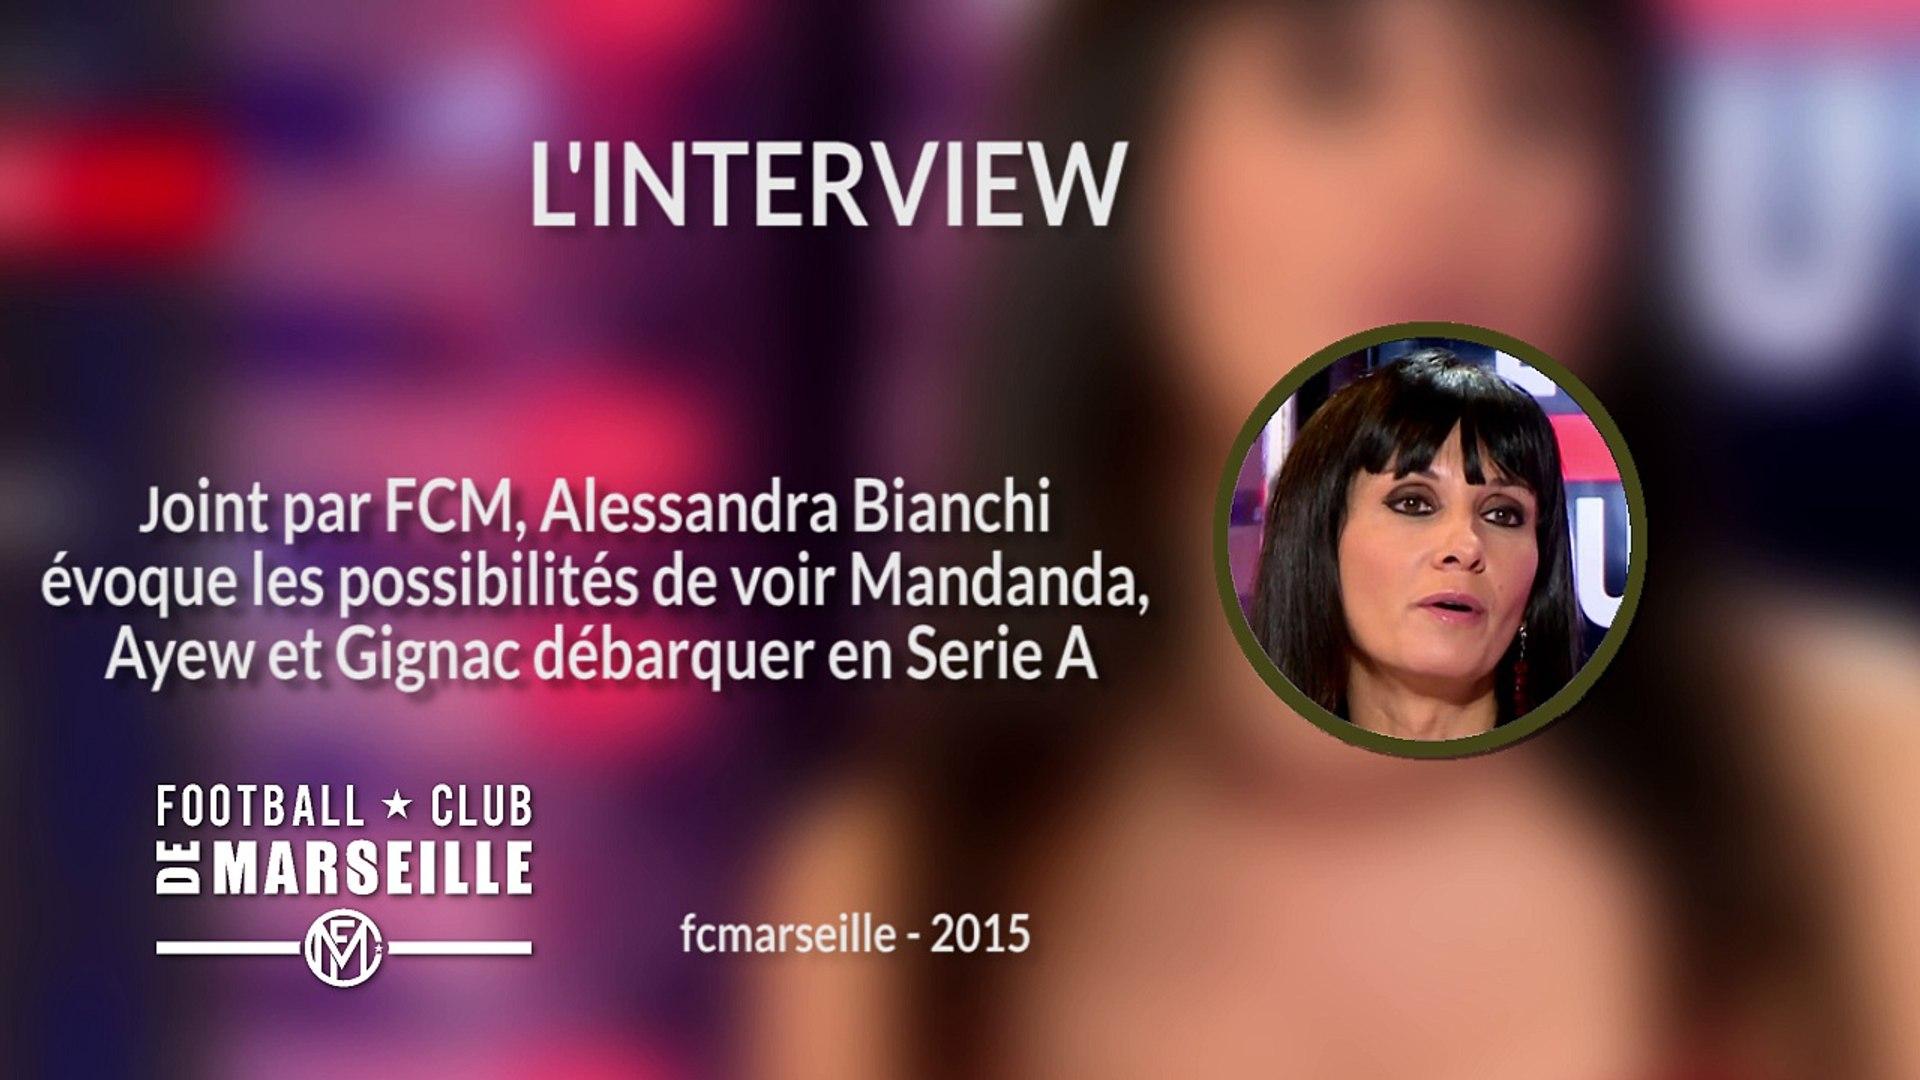 Alessandra Bianchi Architetto alessandra bianchi évoque les dossiers mercato de l'om